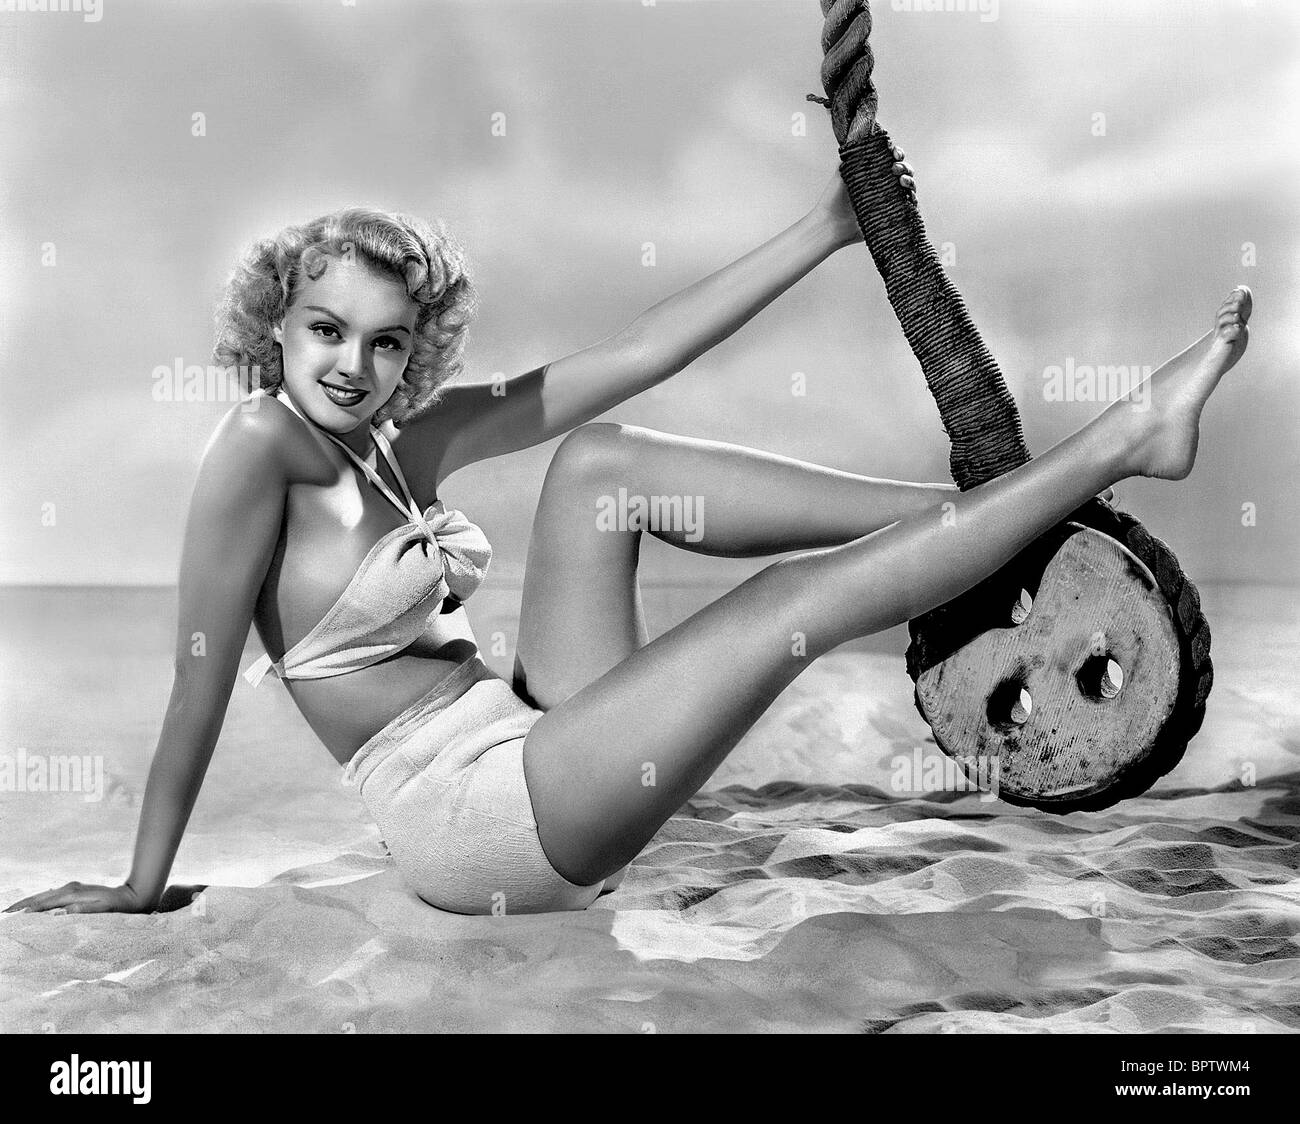 LESLIE BROOKS ACTRESS (1942) - Stock Image